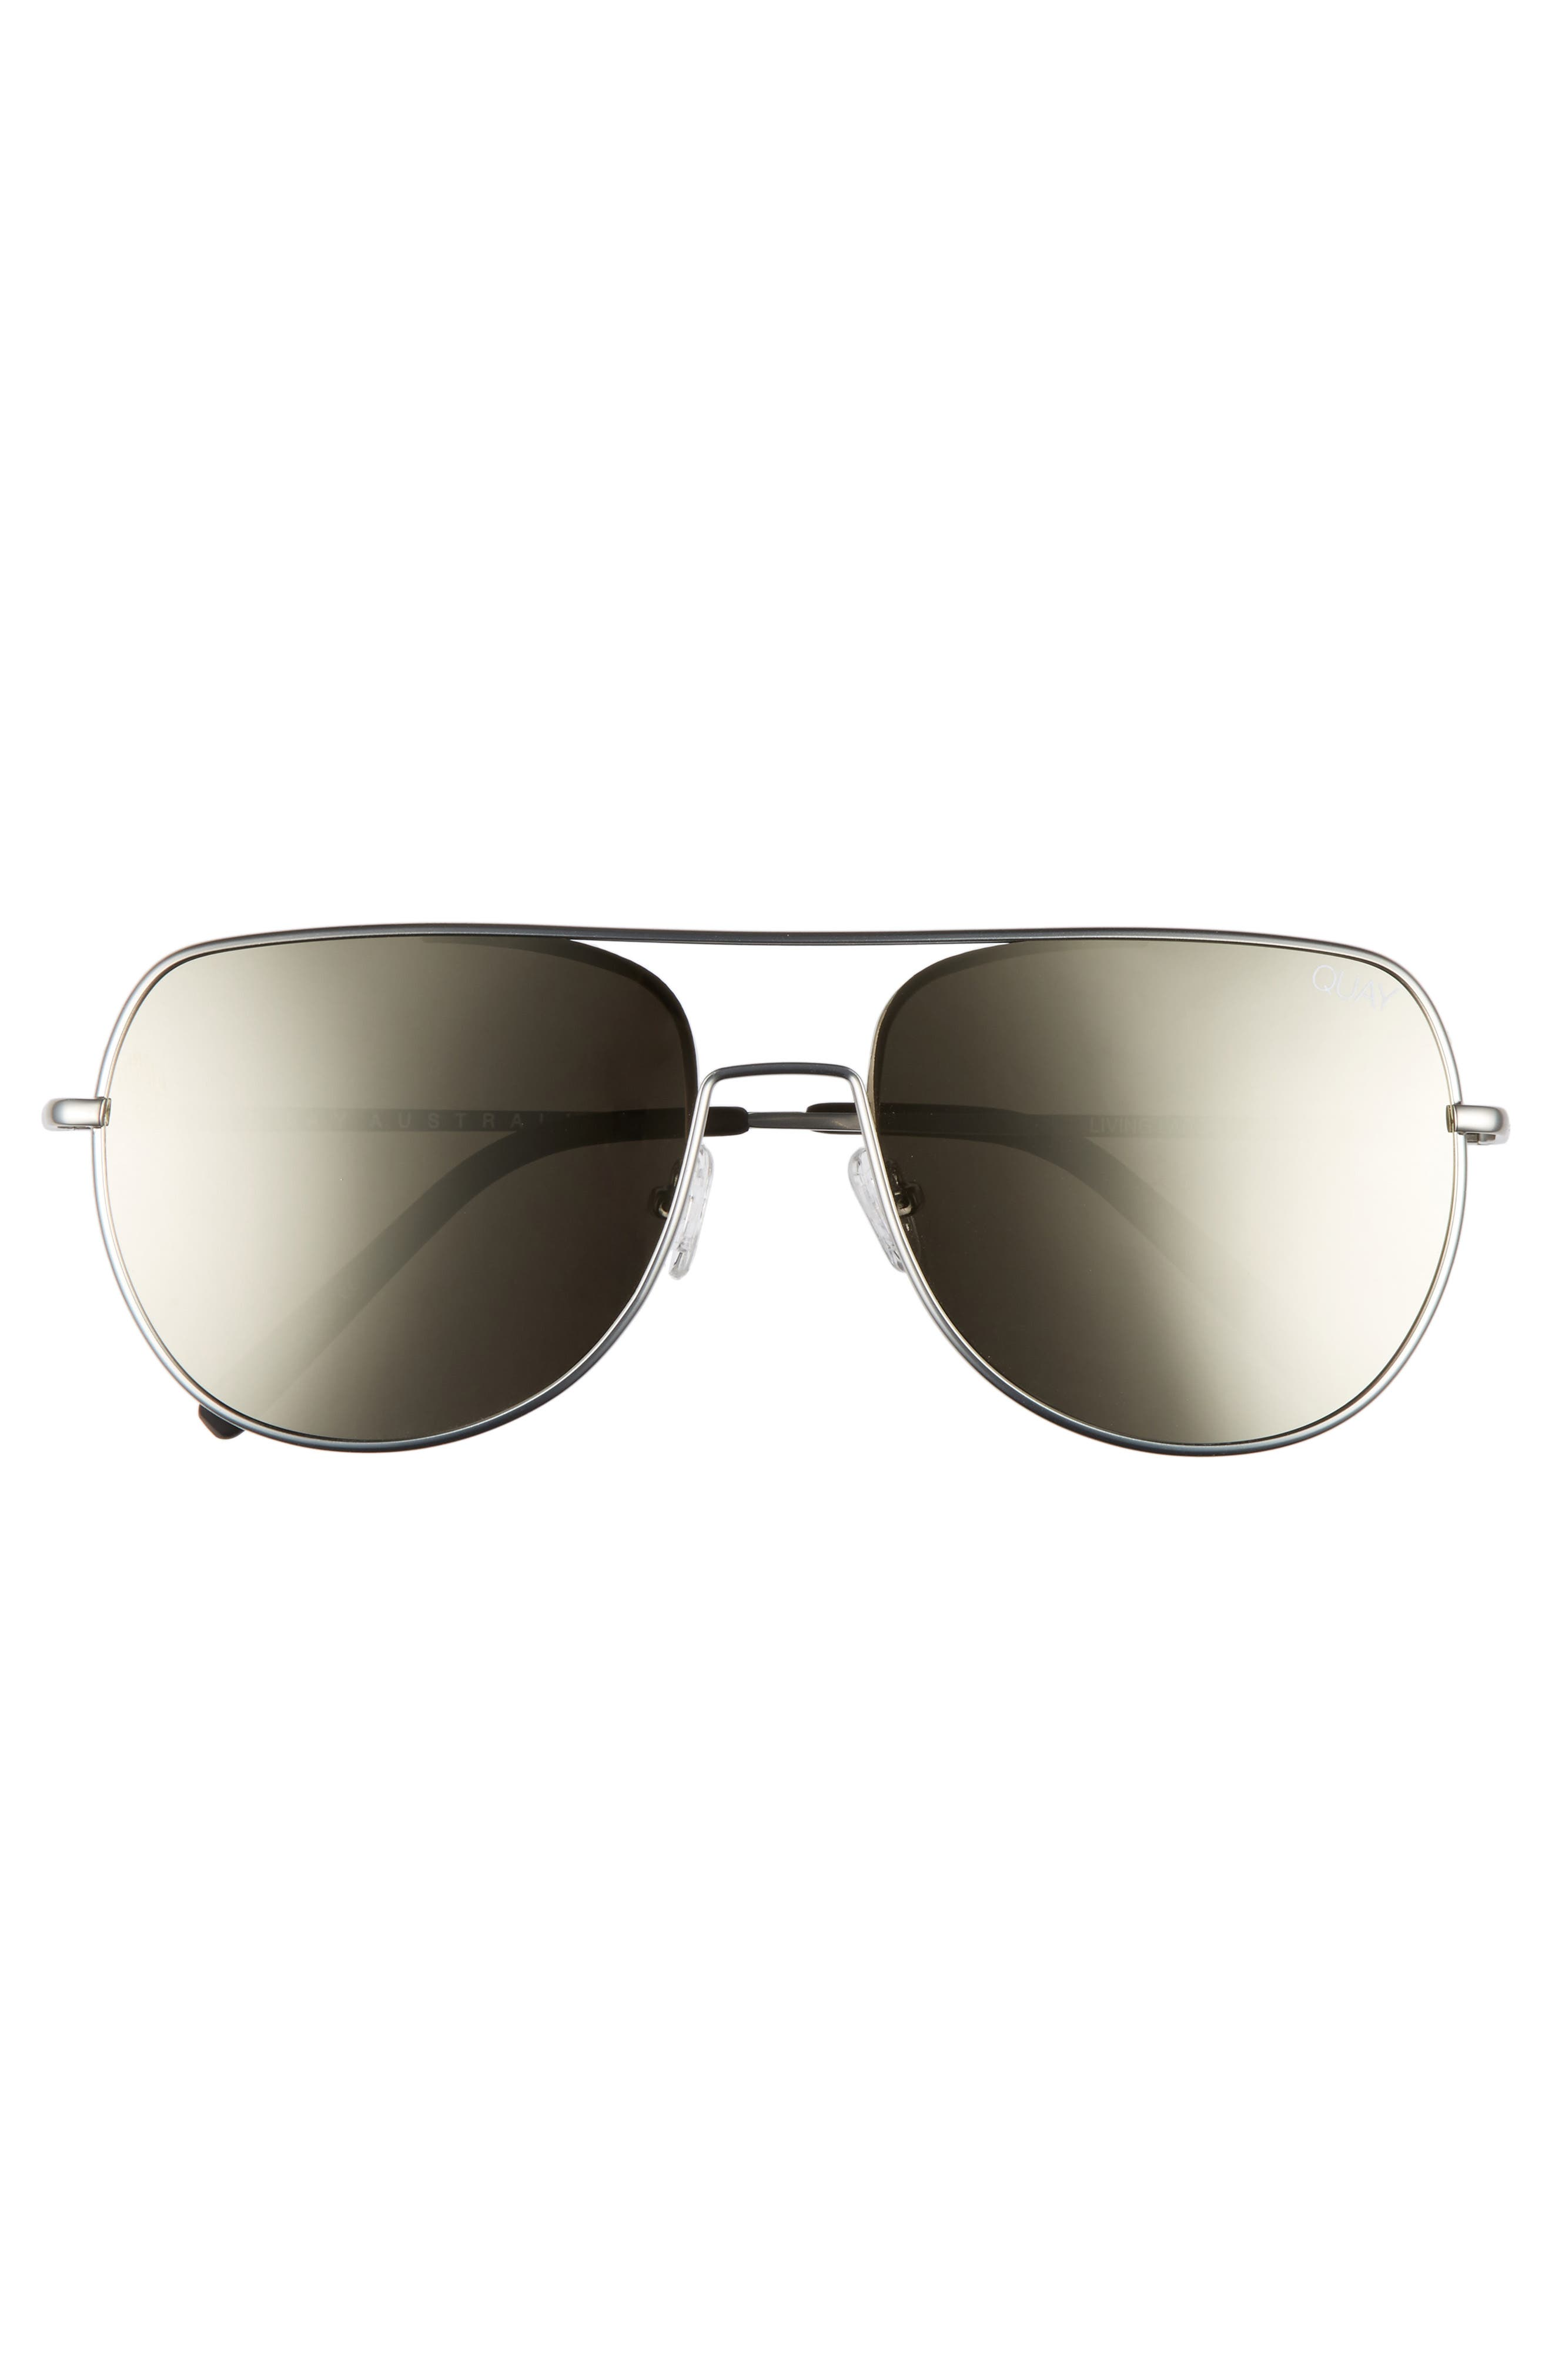 Living Large 61mm Aviator Sunglasses,                             Alternate thumbnail 2, color,                             Silver/ Silver